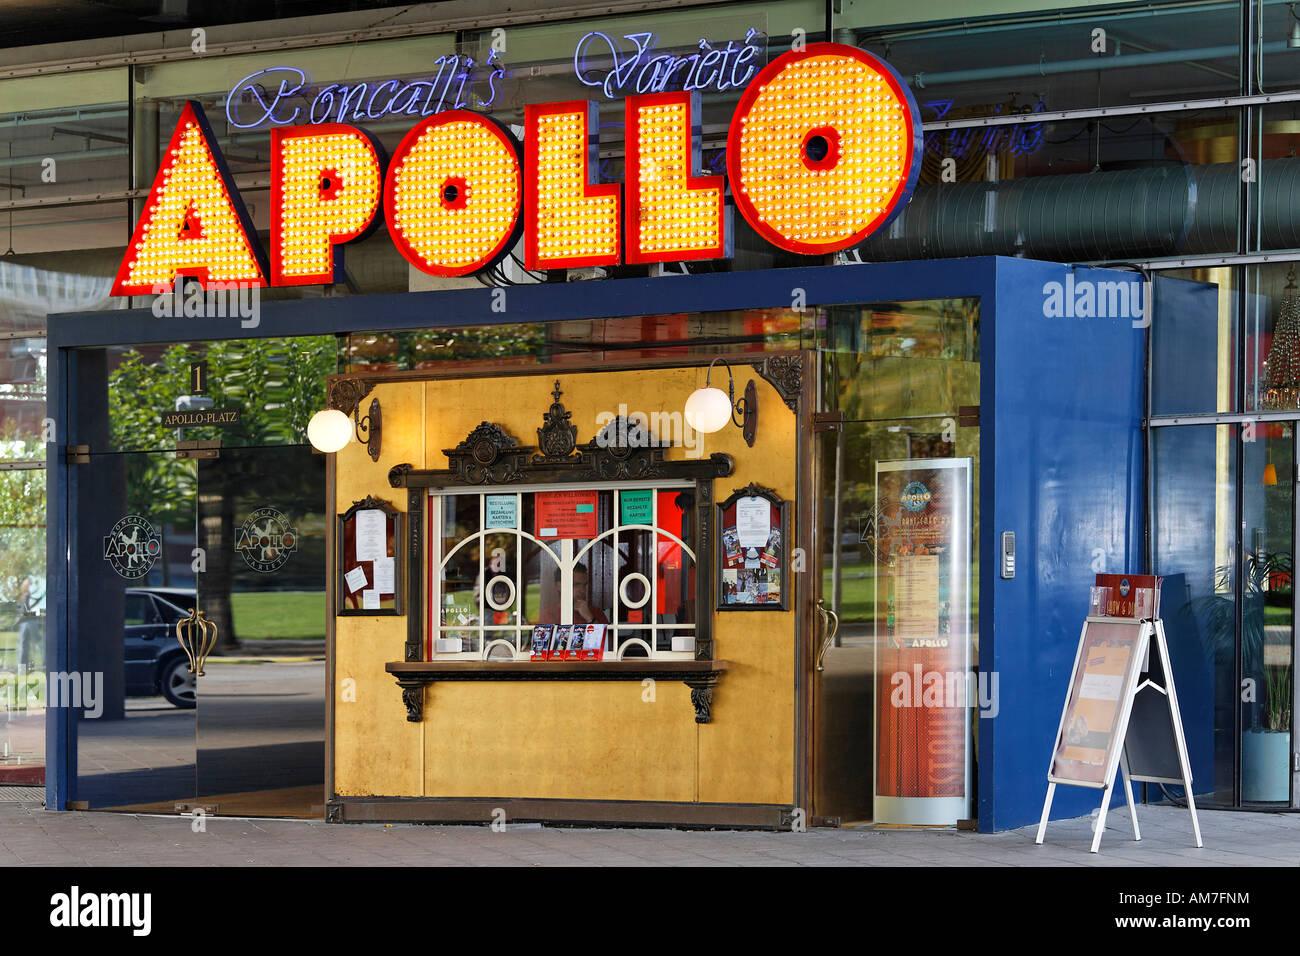 Varietà Teatro Apollo, Duesseldorf, NRW, Germania Foto Stock